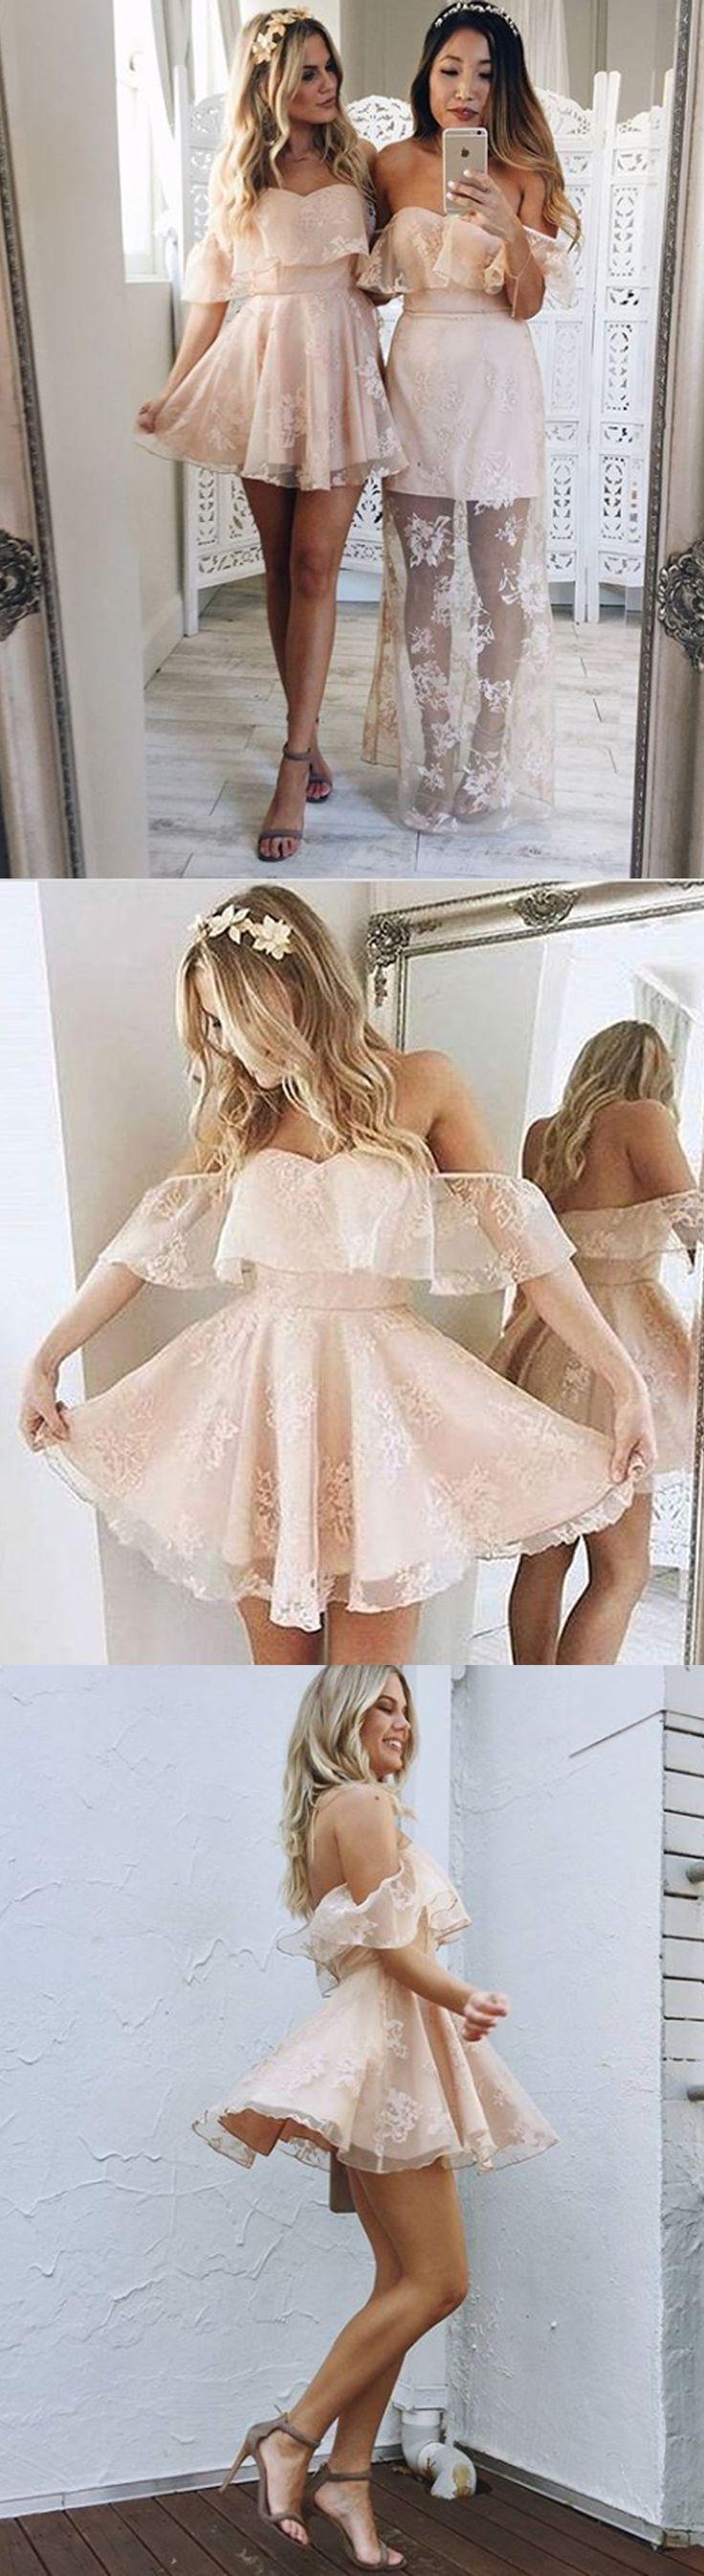 A-Line Homecoming Dresses,Off-the-Shoulder Homecoming Dresses,Short Homecoming Dresses,Pearl Pink Homecoming Dresses,Organza Homecoming Dresses,Appliques Homecoming Dresses,Homecoming Dresses 2017,Graduation Dresses,Dresses For Teens